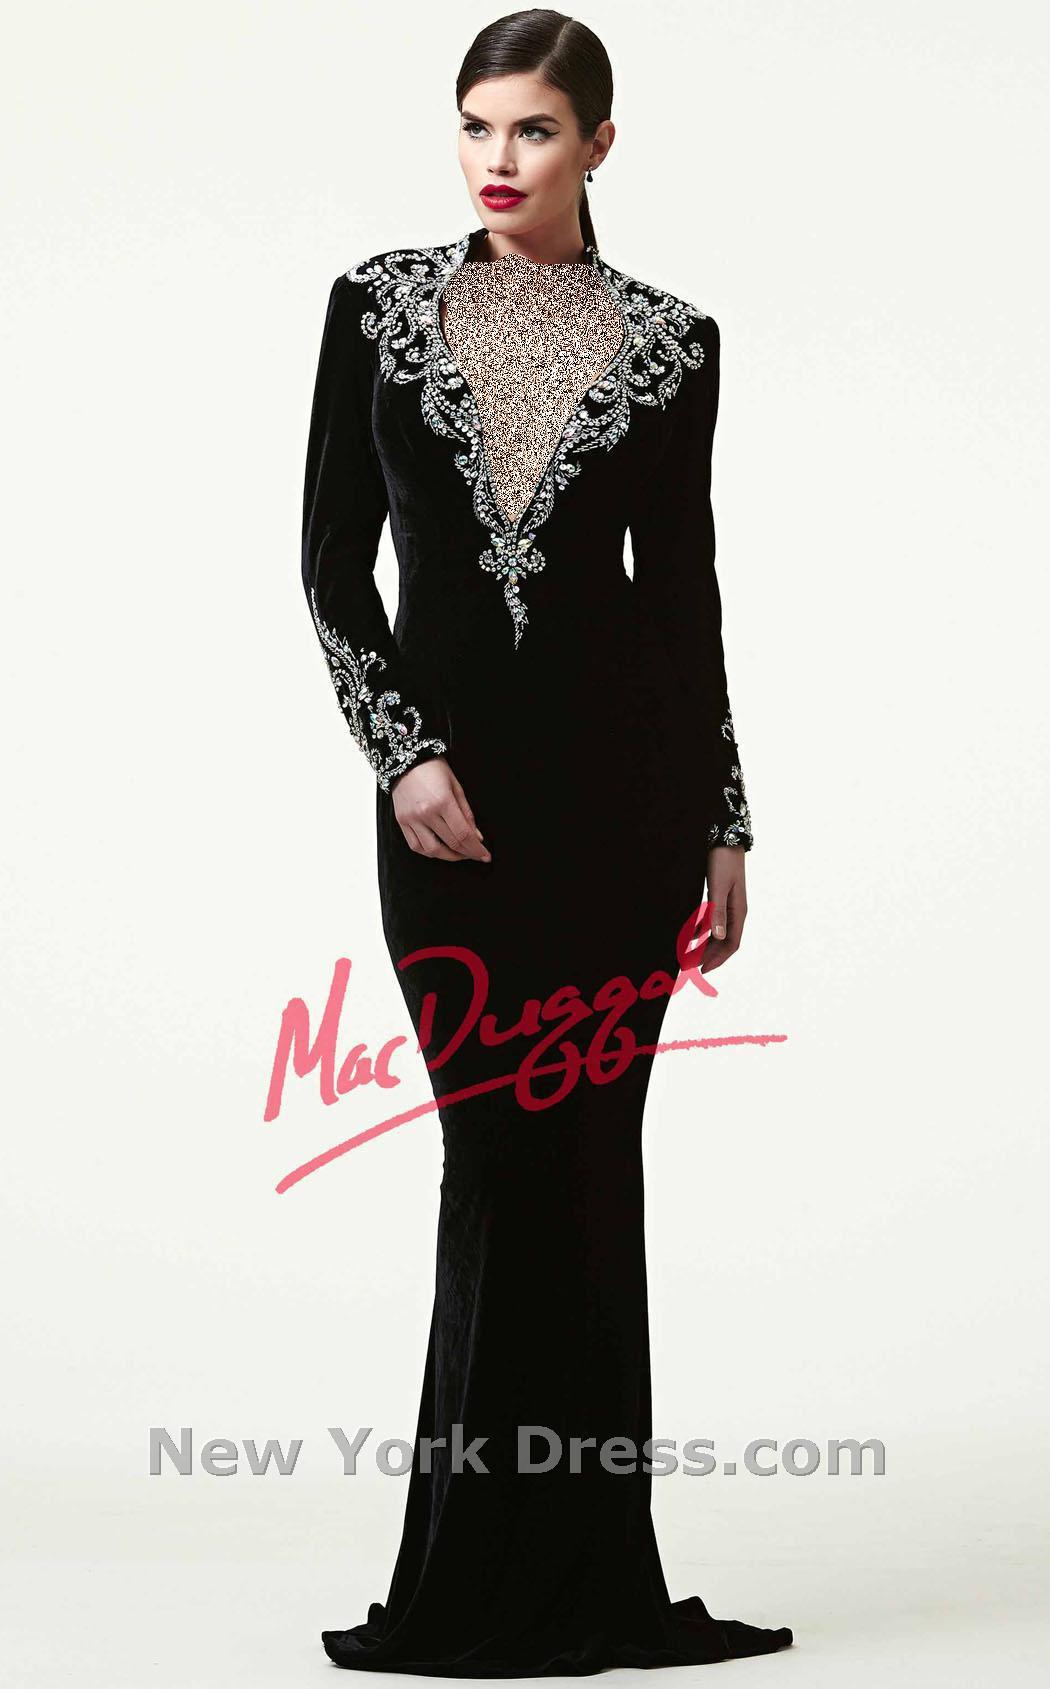 ,مدل لباس شب مشکی 2017, مدل لباس شب مشکی بلند, مدل لباس مجلسی نوین,[categoriy]